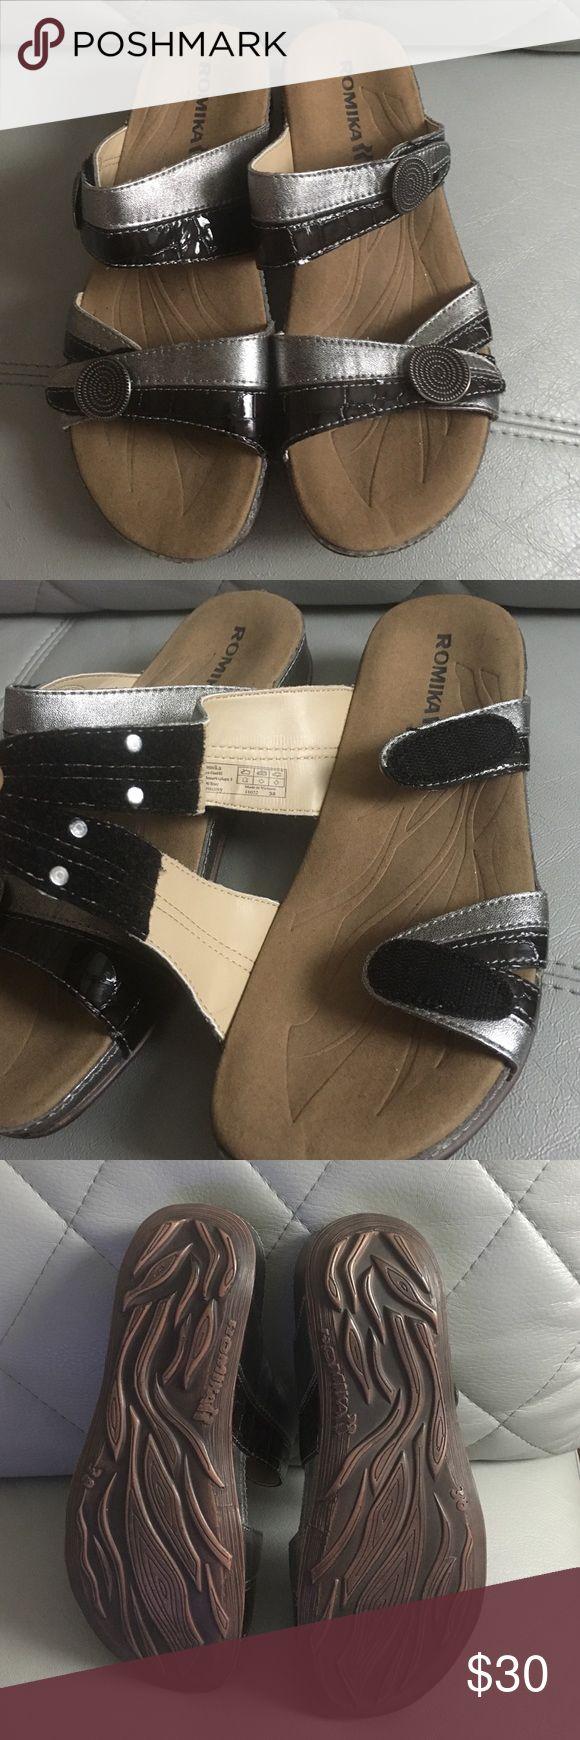 Romika Sandals NWOT. Adjustable Velcro straps. Romika Shoes Sandals